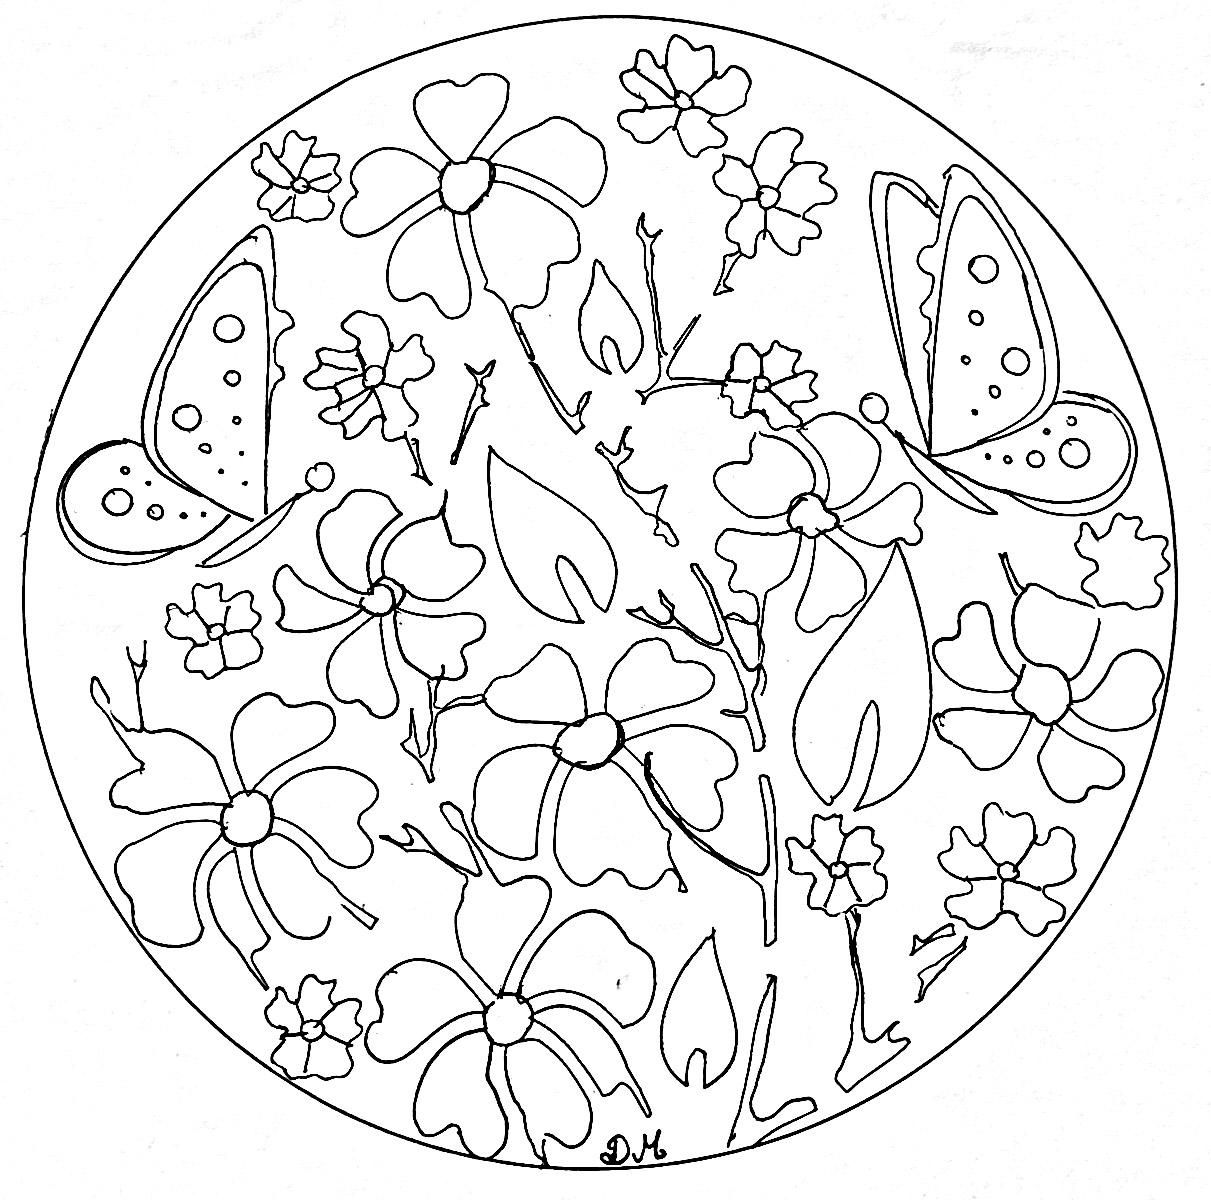 Mandala facile fleurs papillons coloriage mandalas coloriages pour enfants - Coloriage fleur mandala ...